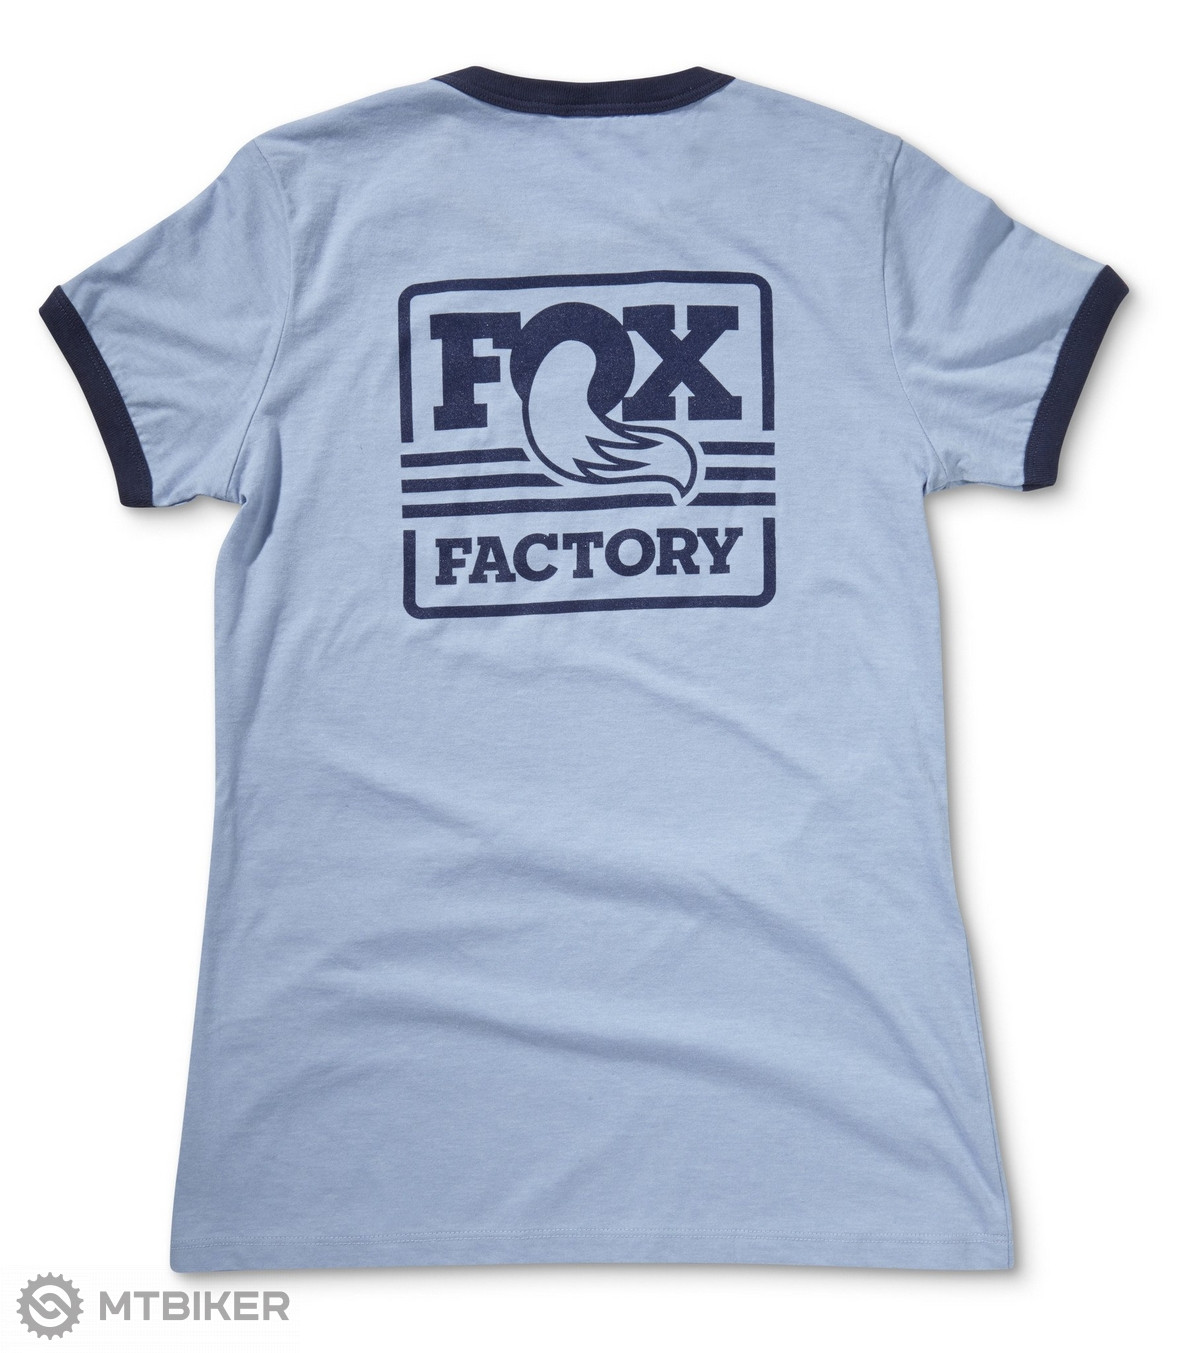 96fcd46831 Fox dámske tričko Heritage Ringer Tee - MTBIKER Shop